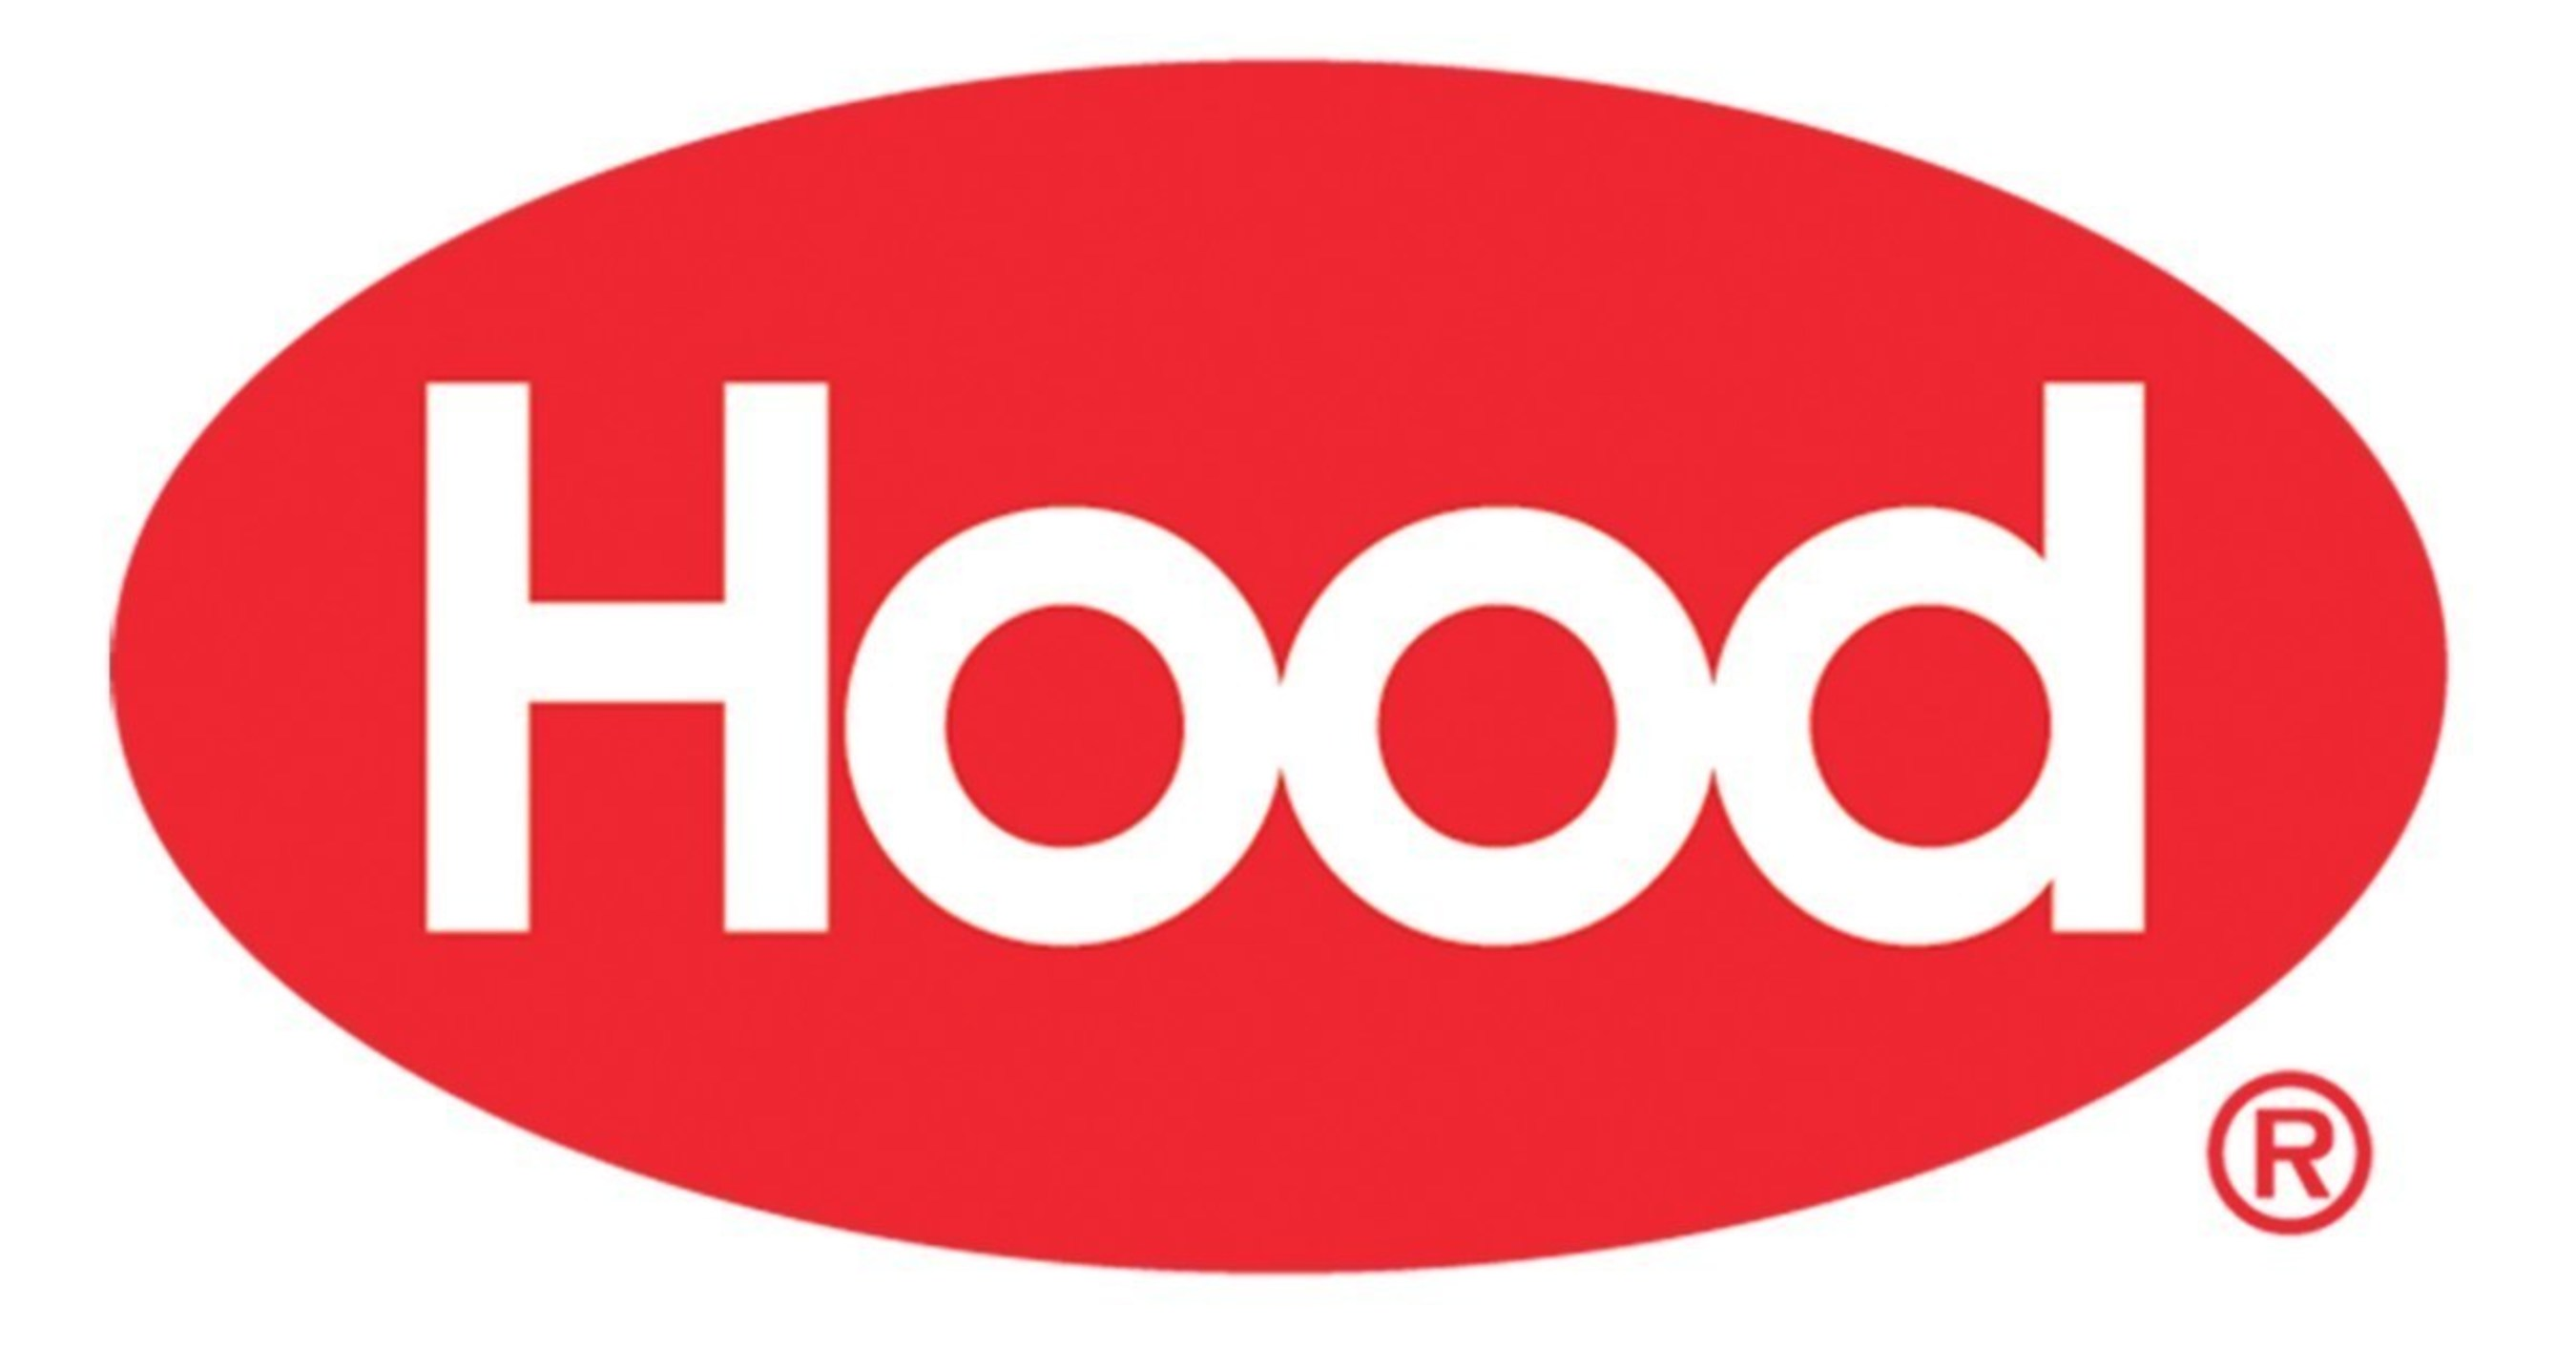 HP Hood logo